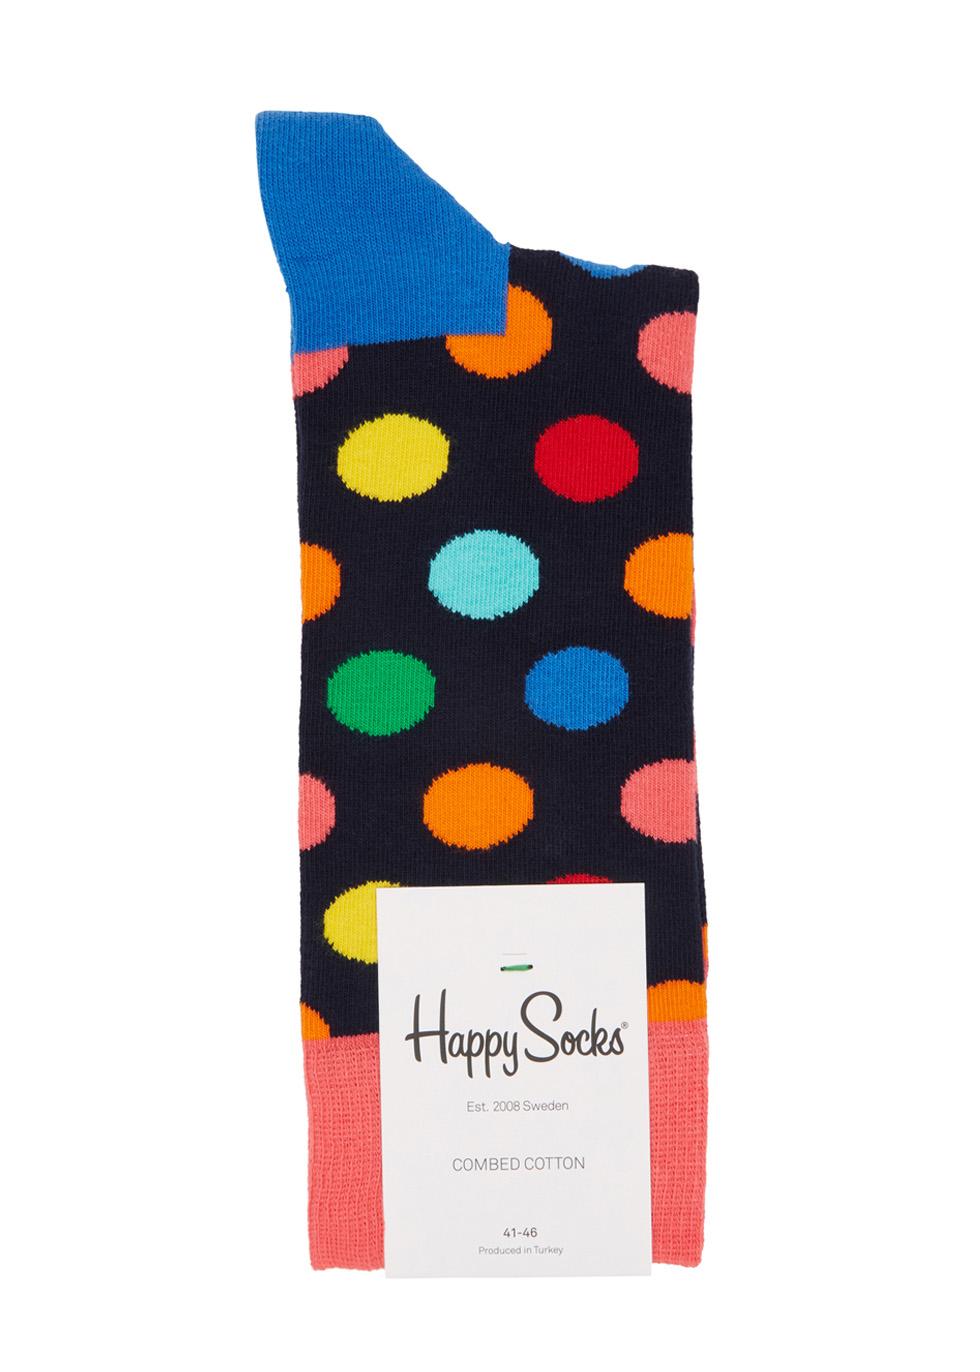 Dot cotton blend socks - Happy Socks